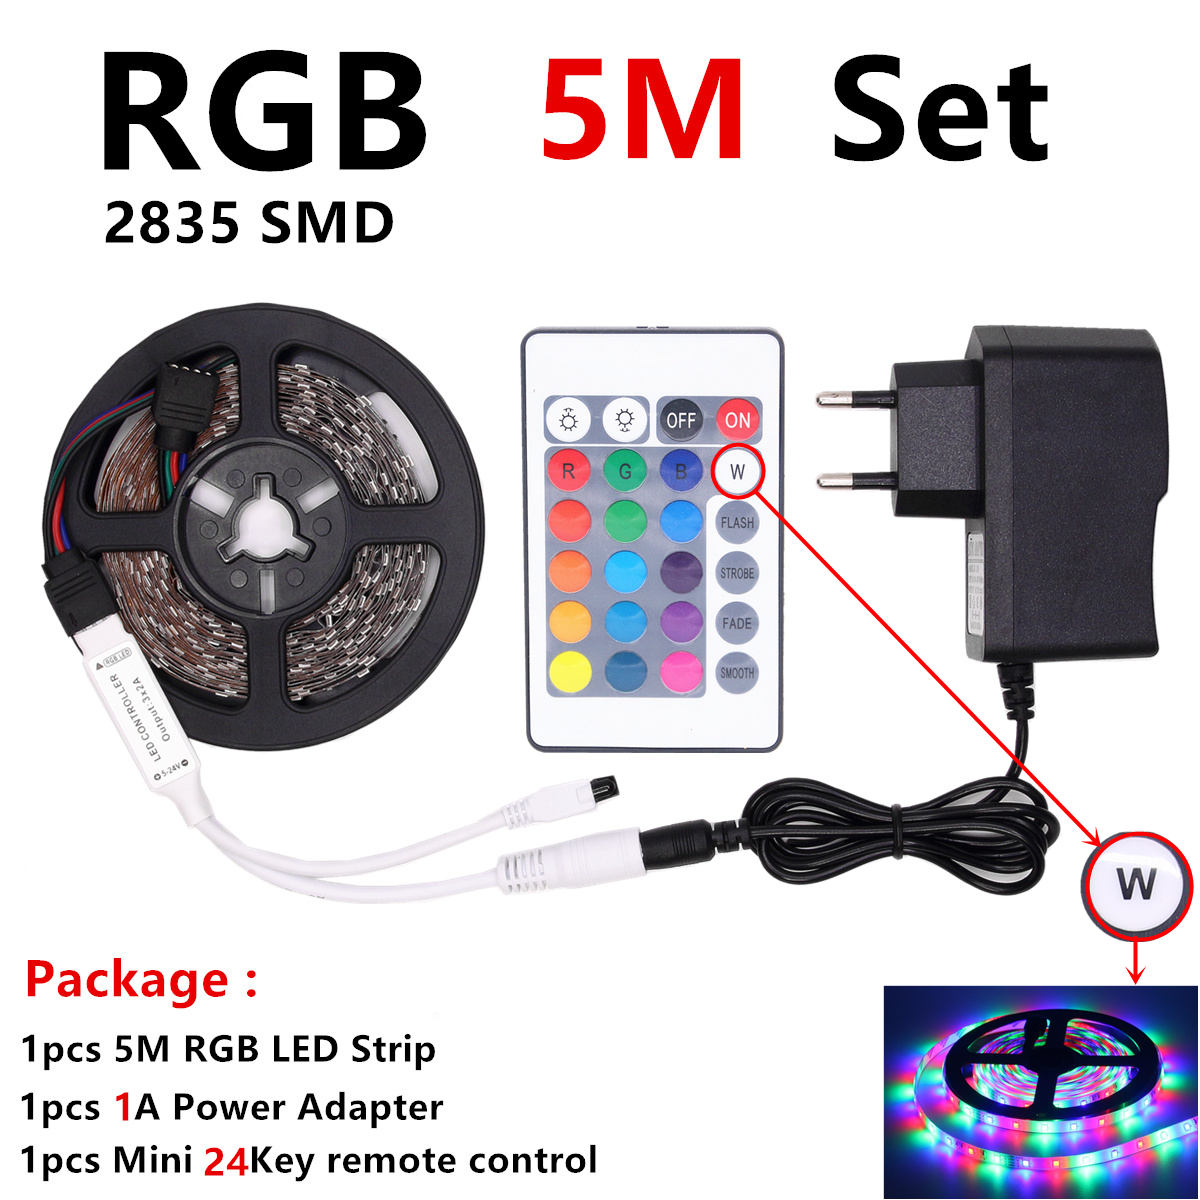 HTB10e8oXvWG3KVjSZPcq6zkbXXa9 RGB LED Strip Waterproof 2835 5M 10M DC12V Fita LED Light Strip Neon LED 12V Flexible Tape Ledstrip With Controller and Adapter